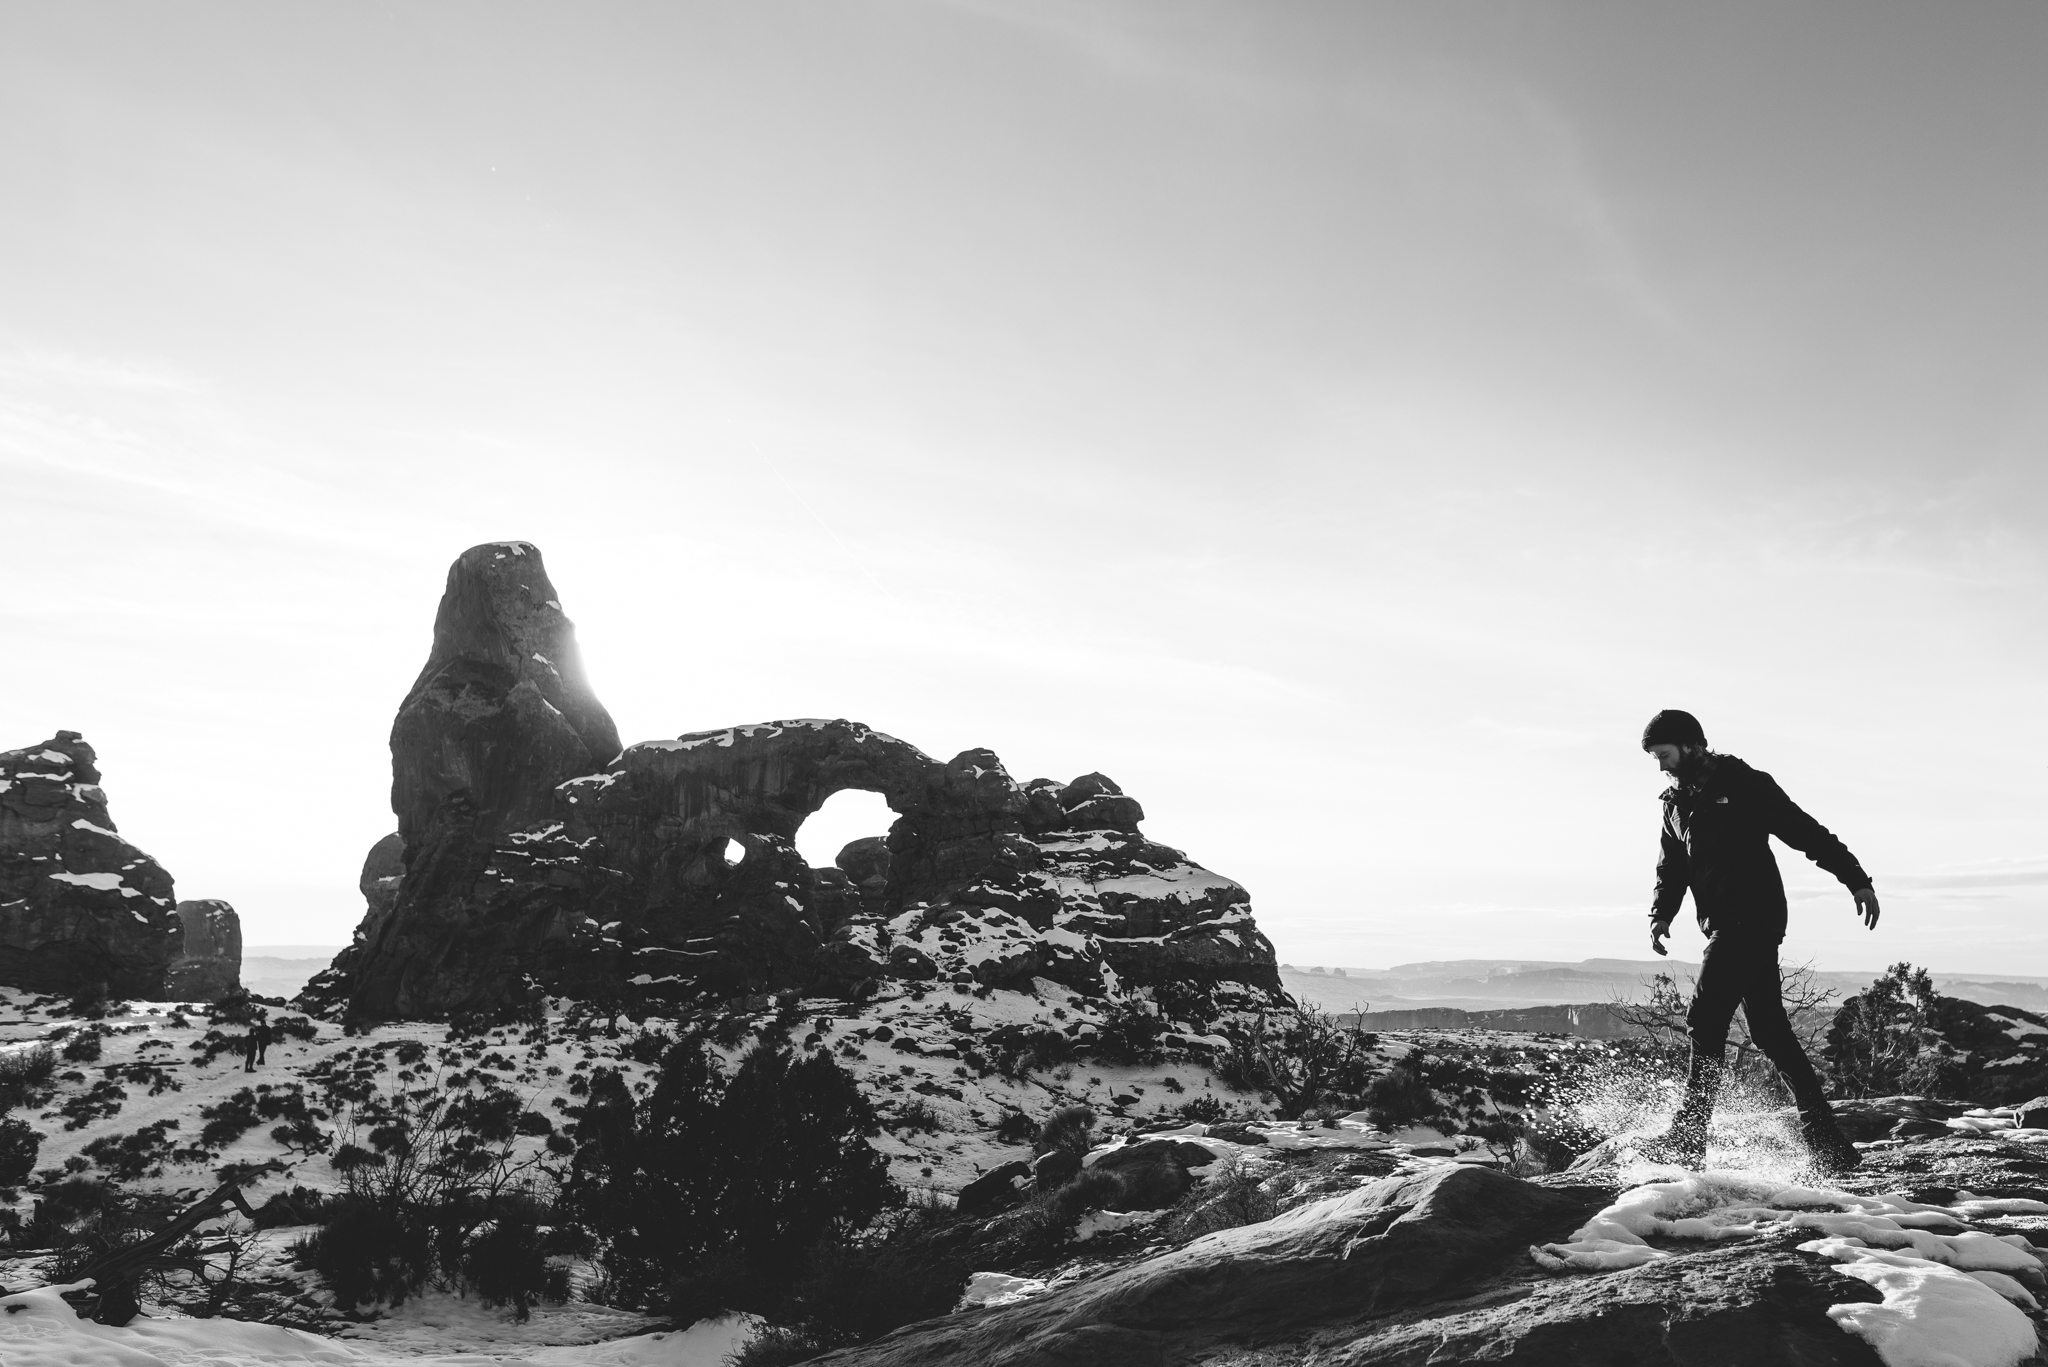 Isaiah-&-Taylor-Photography---White-Sand-Dunes-18.jpg